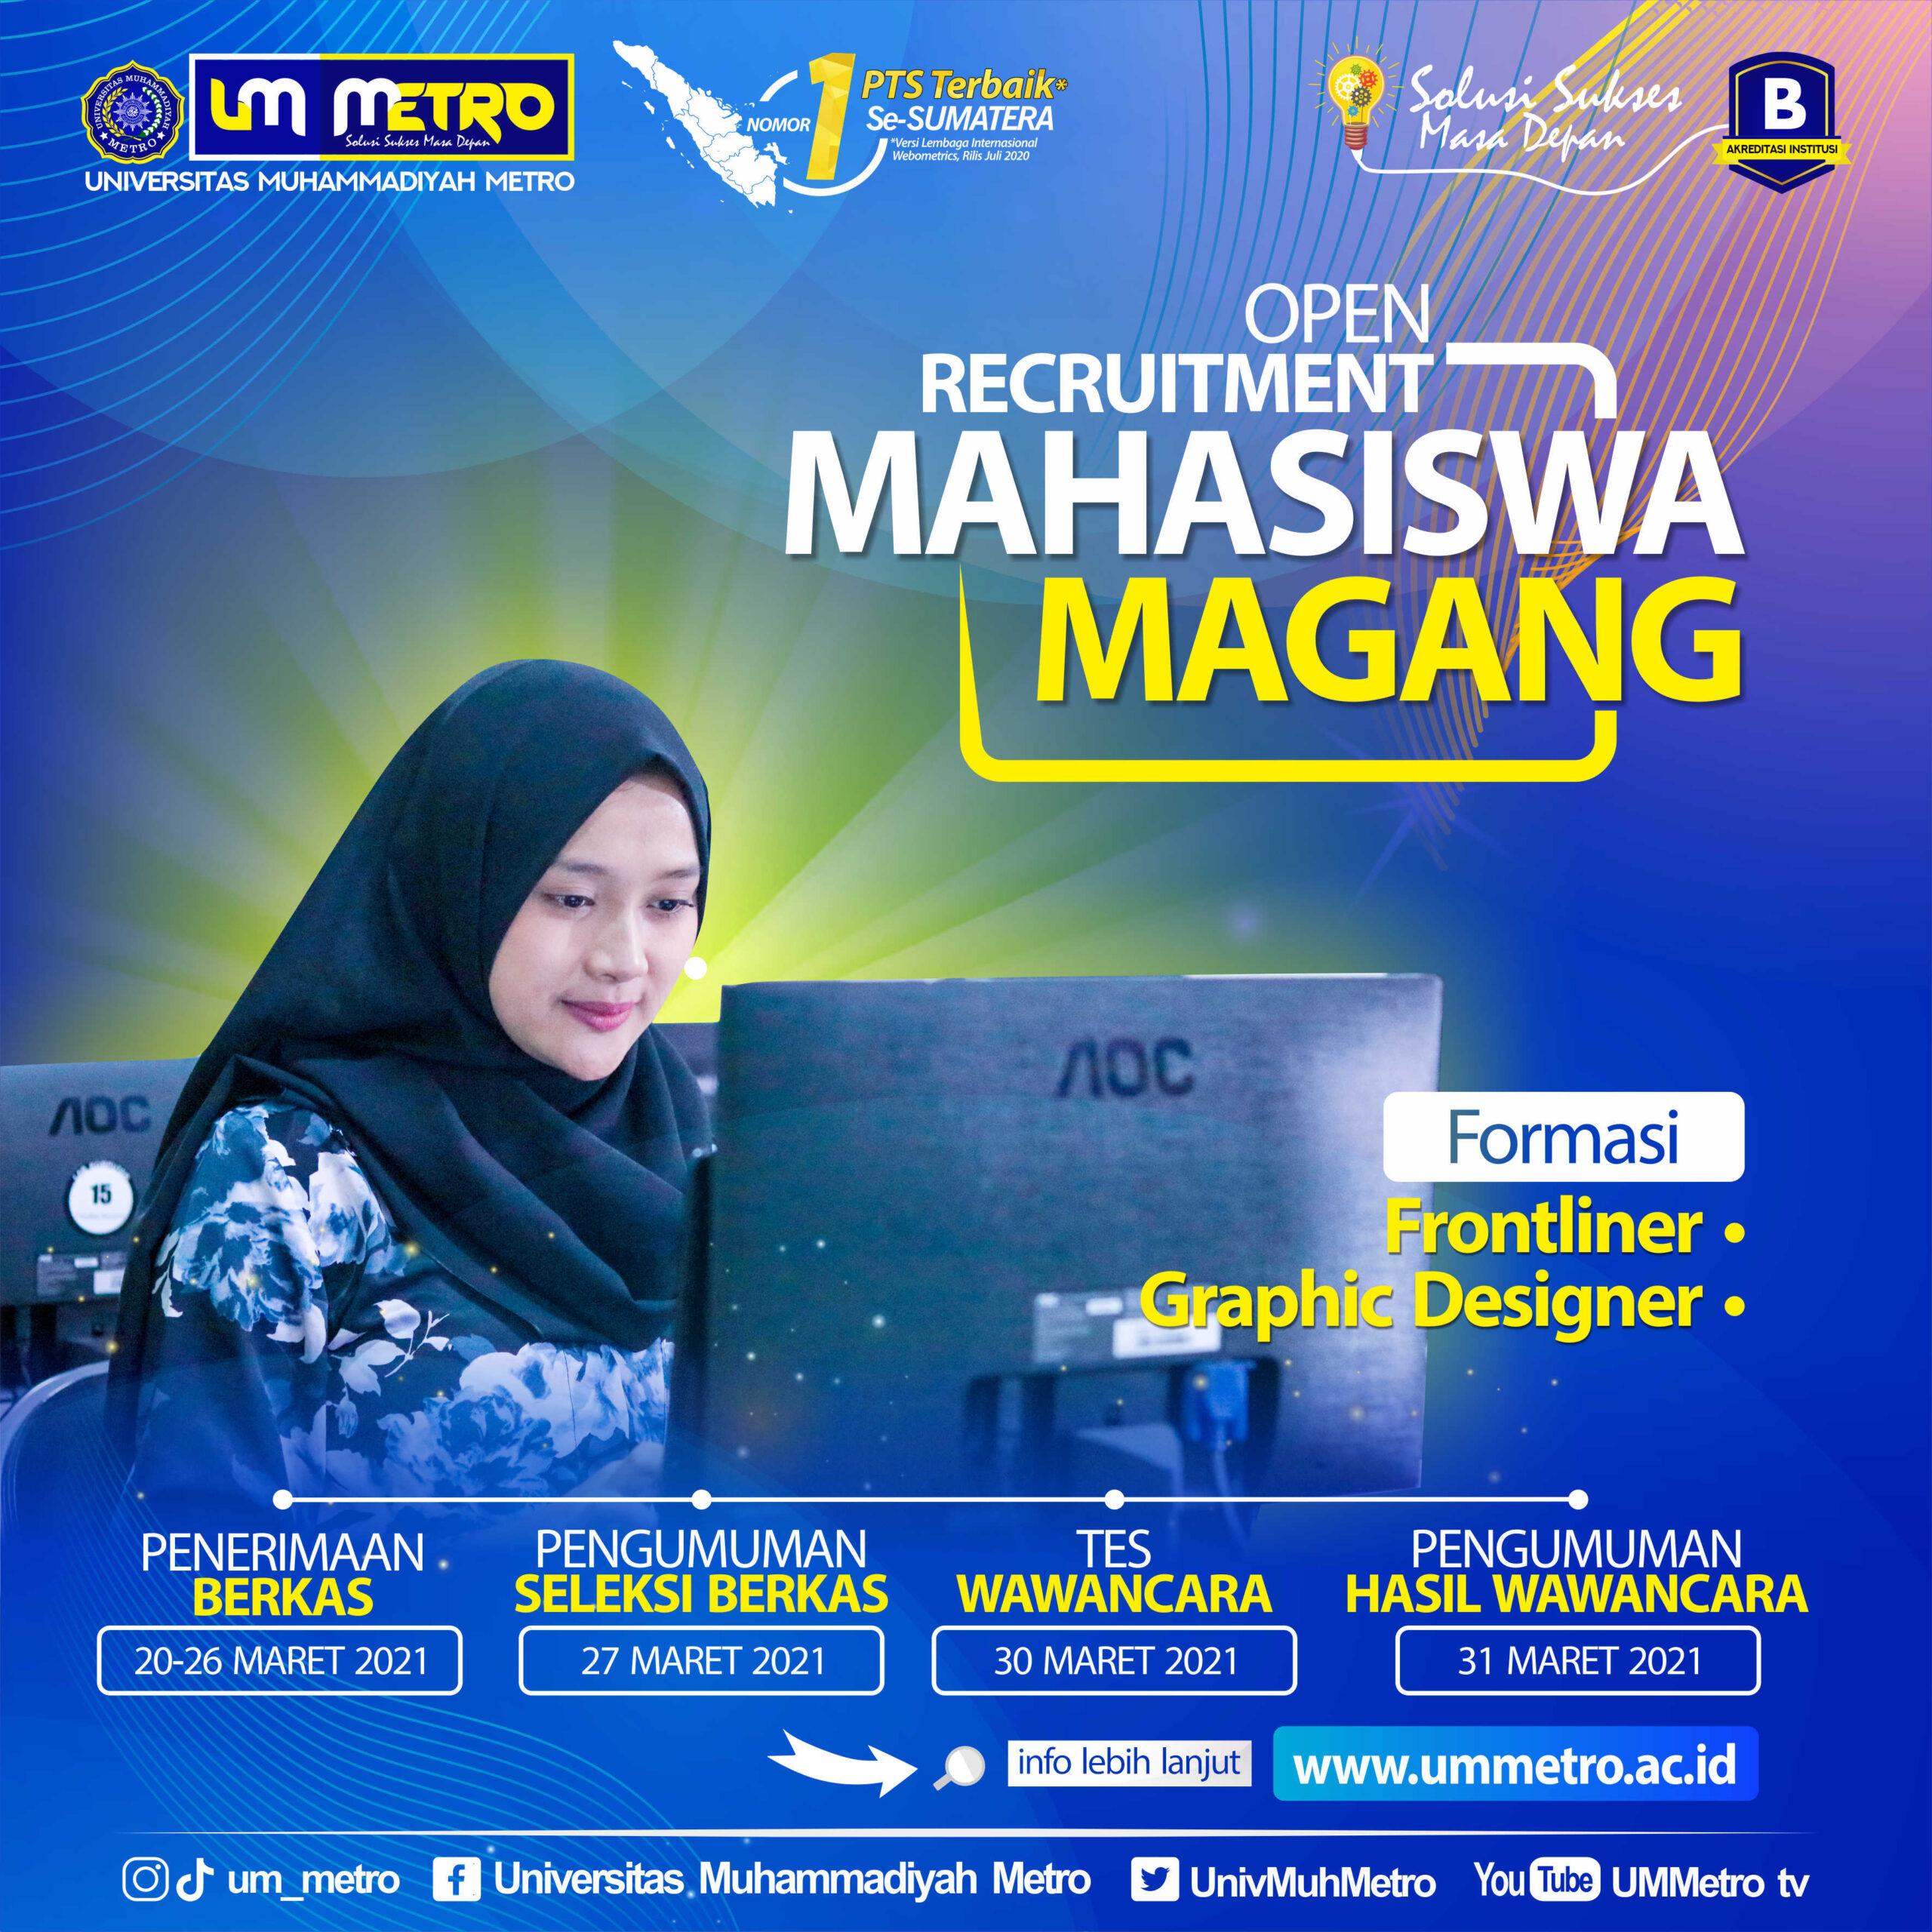 Open Recruitment Mahasiswa Magang UM Metro Tahun 2021